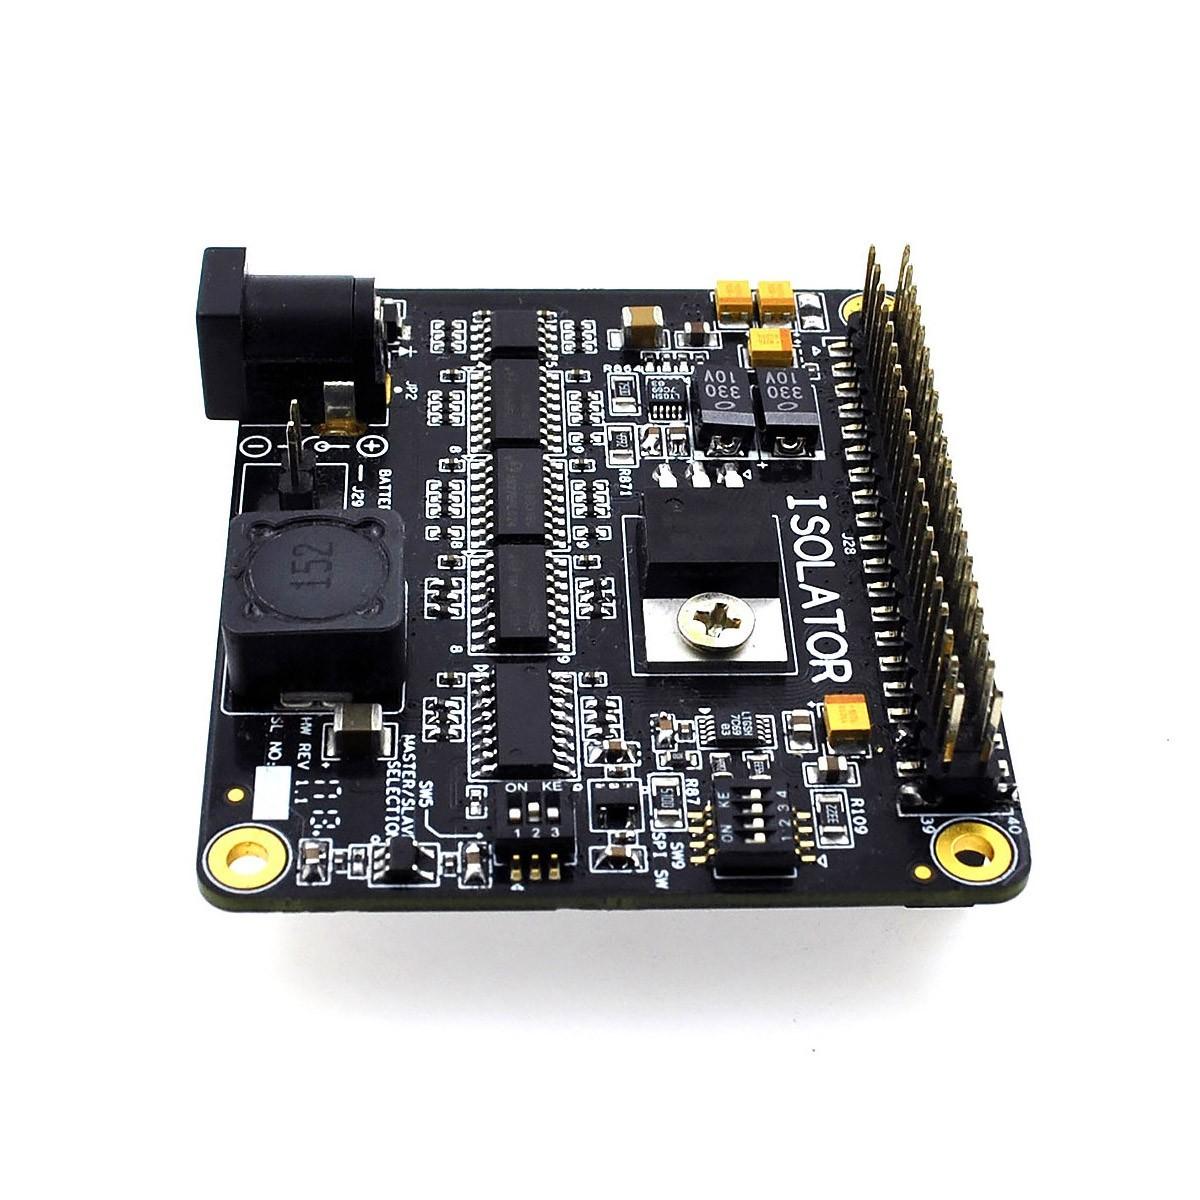 ALLO ISOLATOR V1 Isolateur Galvanique I2S GPIO pour Sparky / Raspberry PI